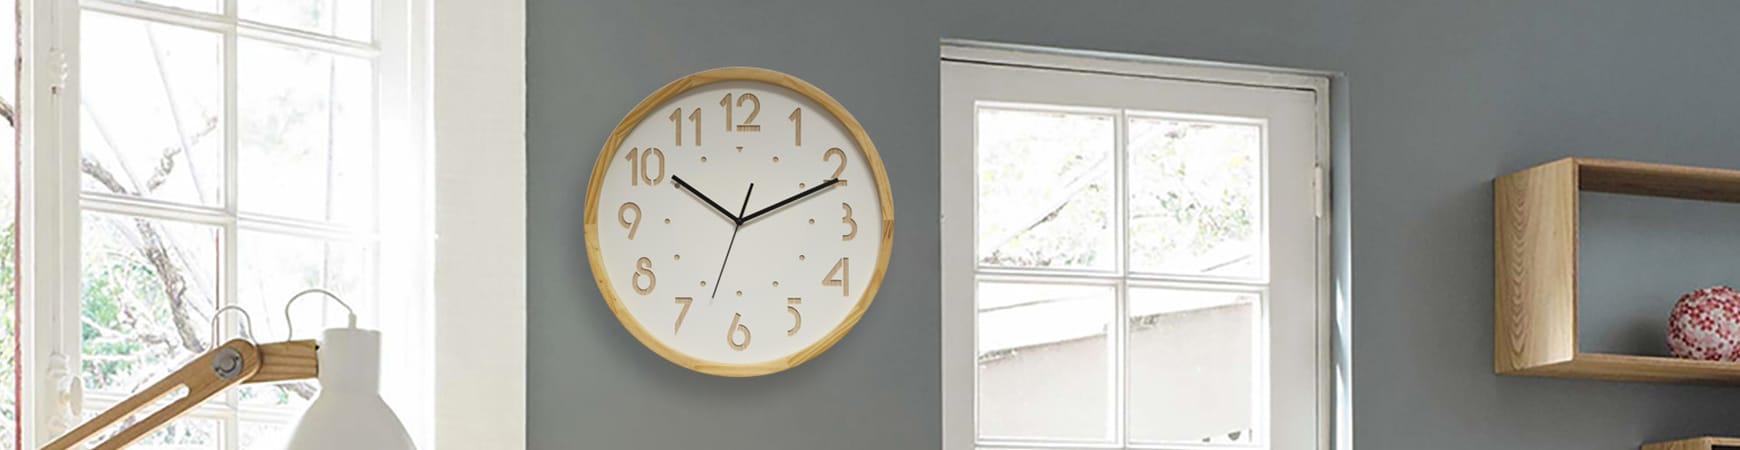 Horloge à LED 3D